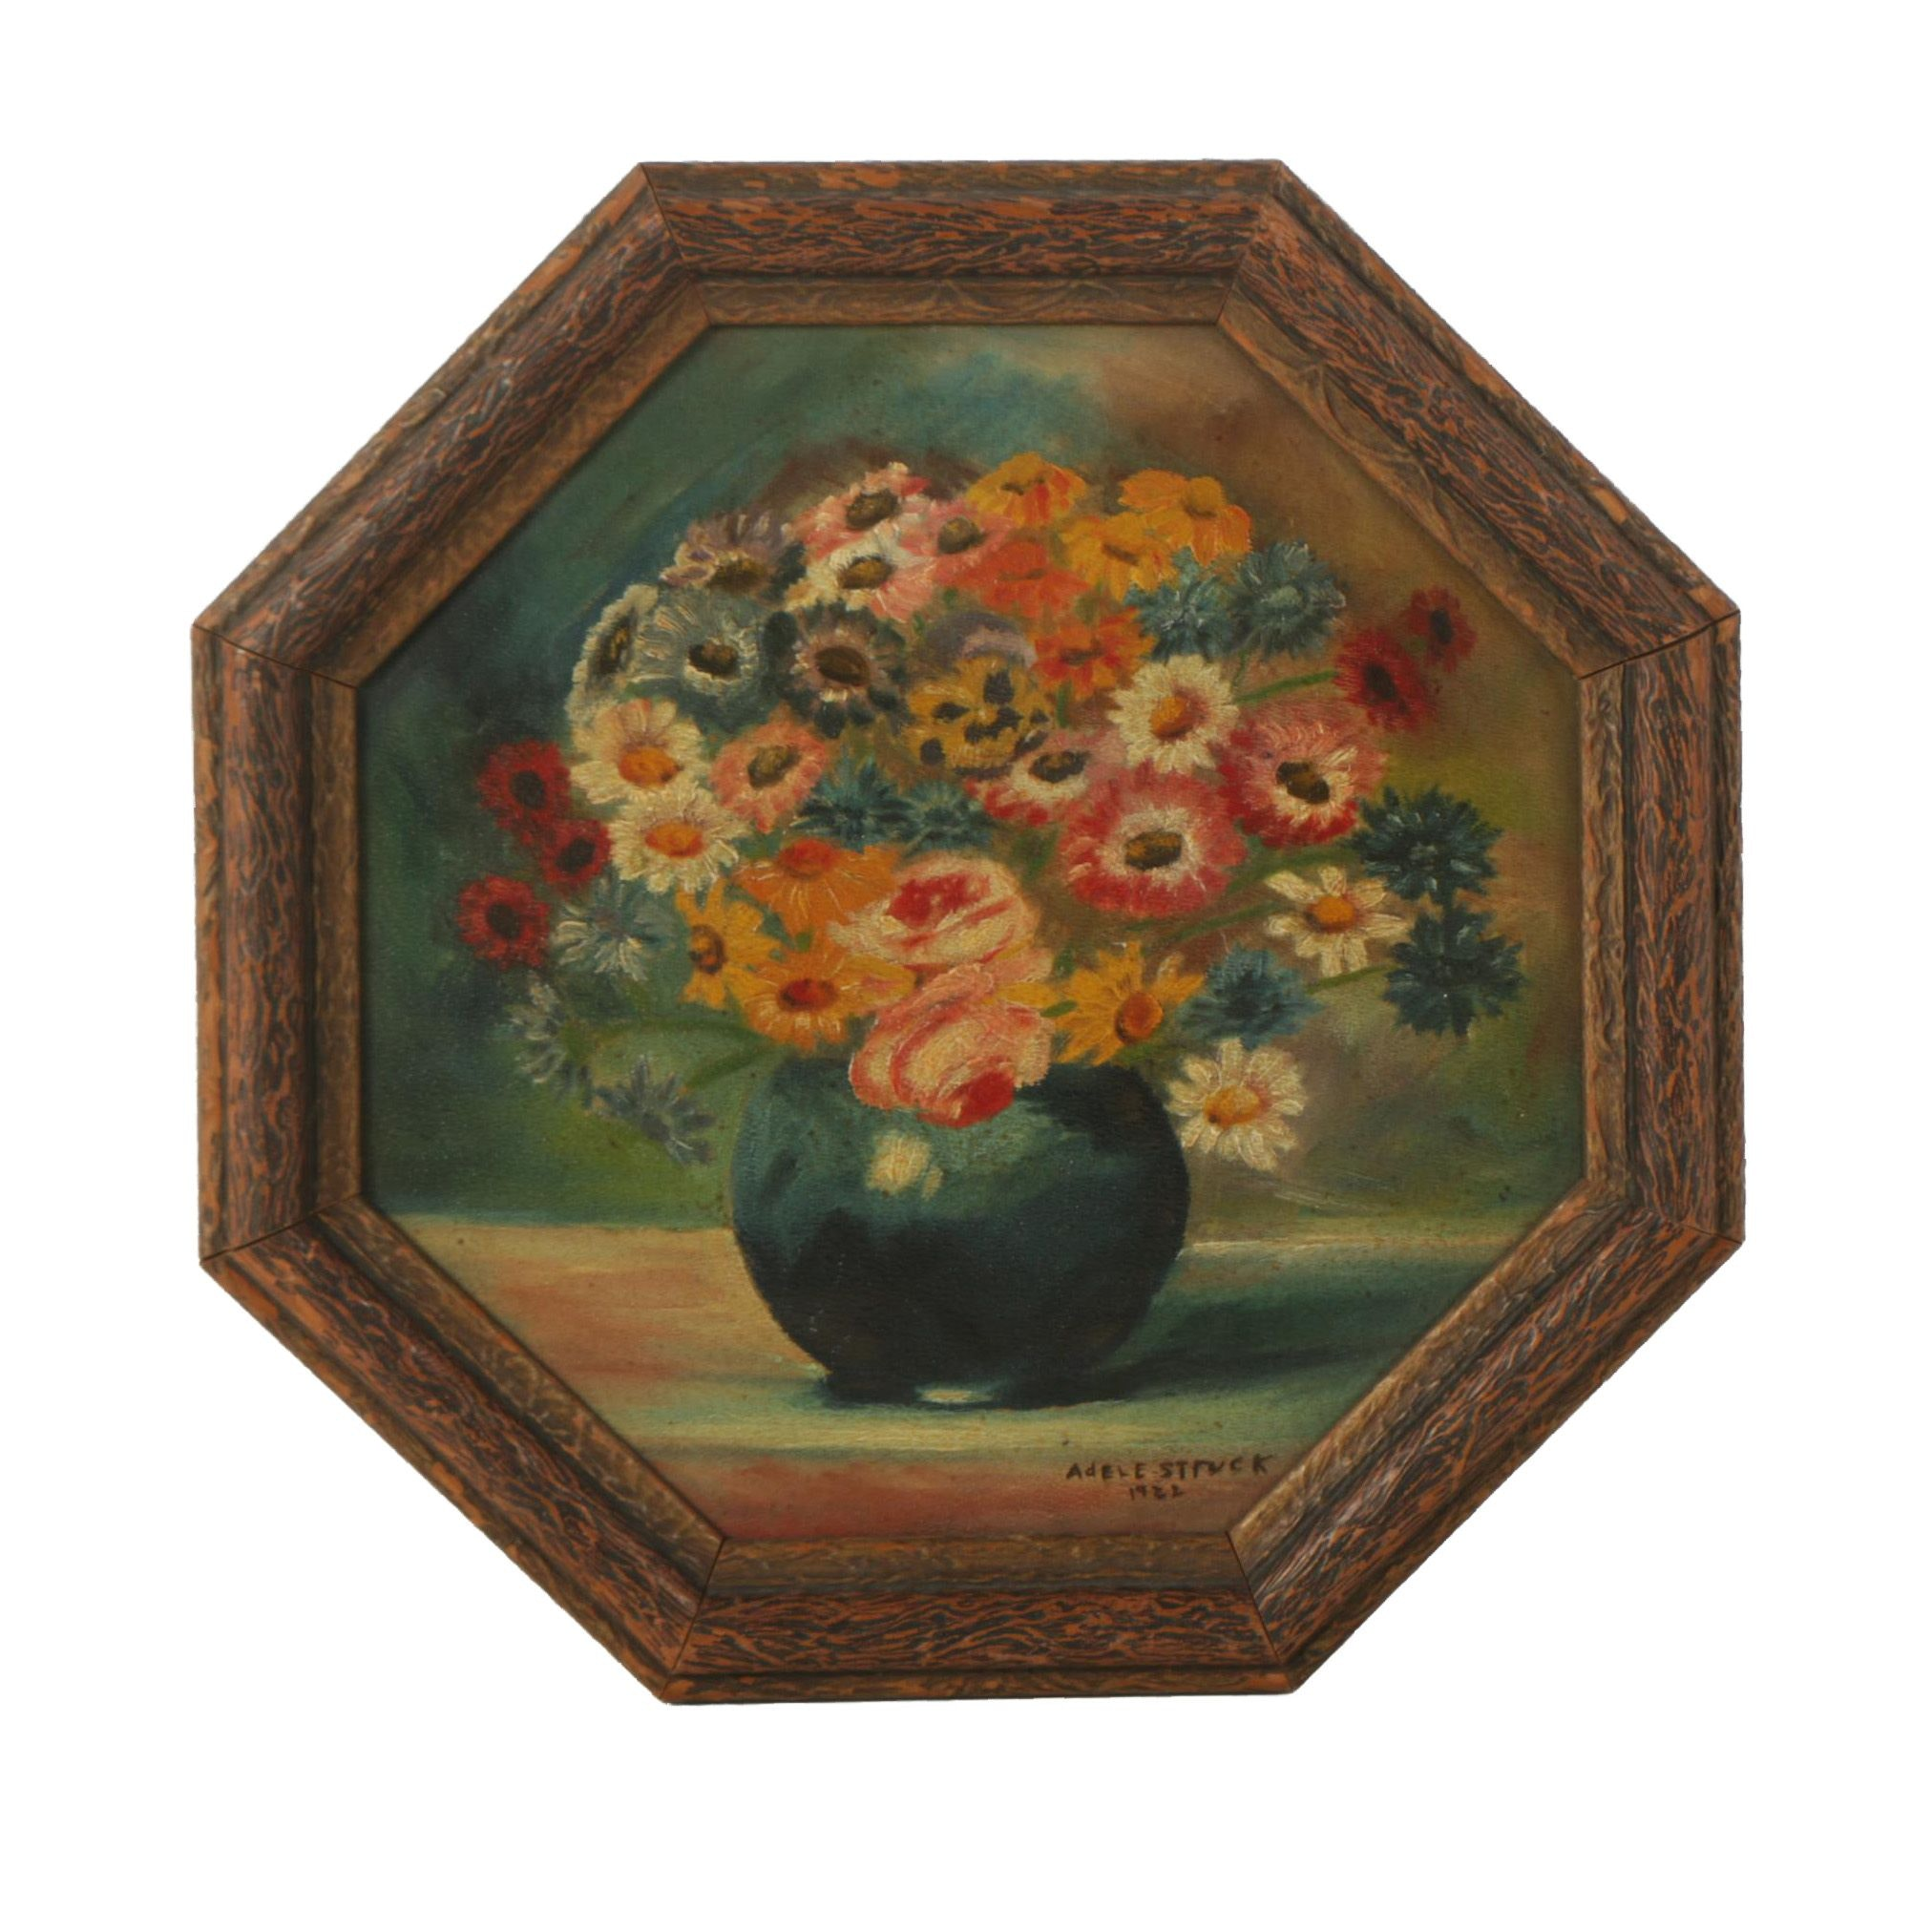 Adele Struck Oil Painting of a Flower Arrangement on Octagonal Board